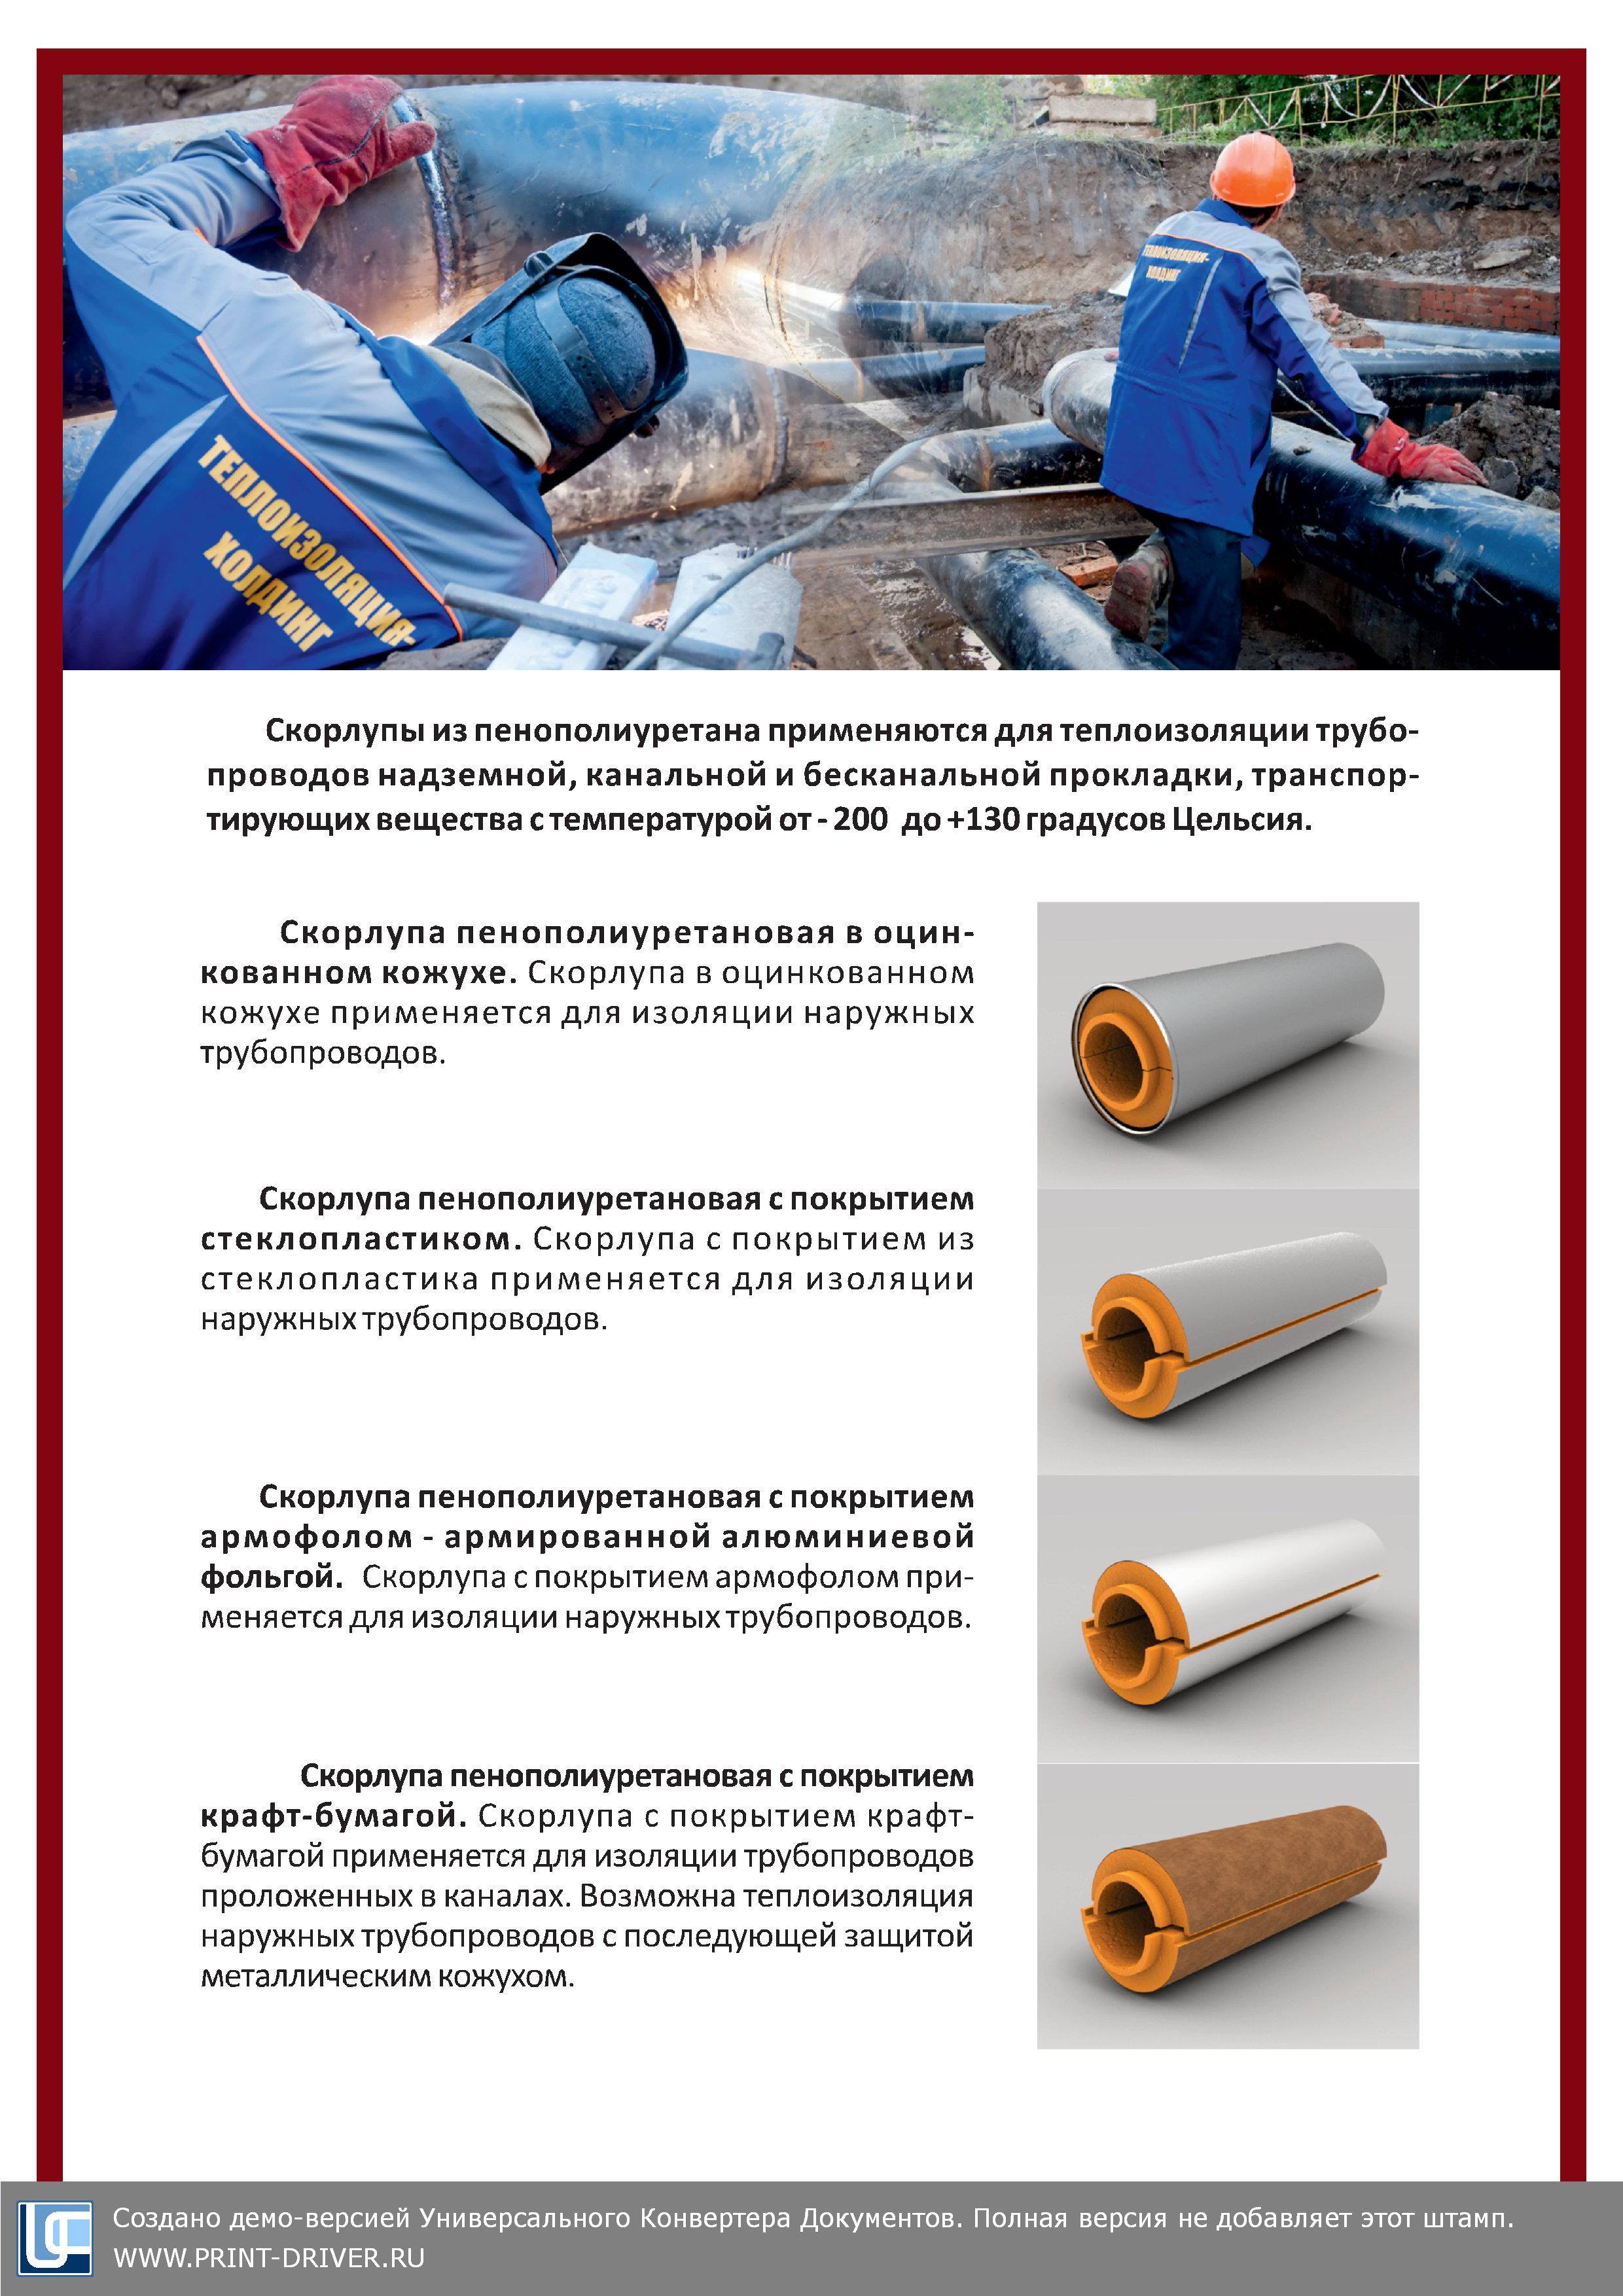 Скорлупа ппу для труб – теплоизоляция труб пенополиуретаном, характеристики, размеры + фото-видео